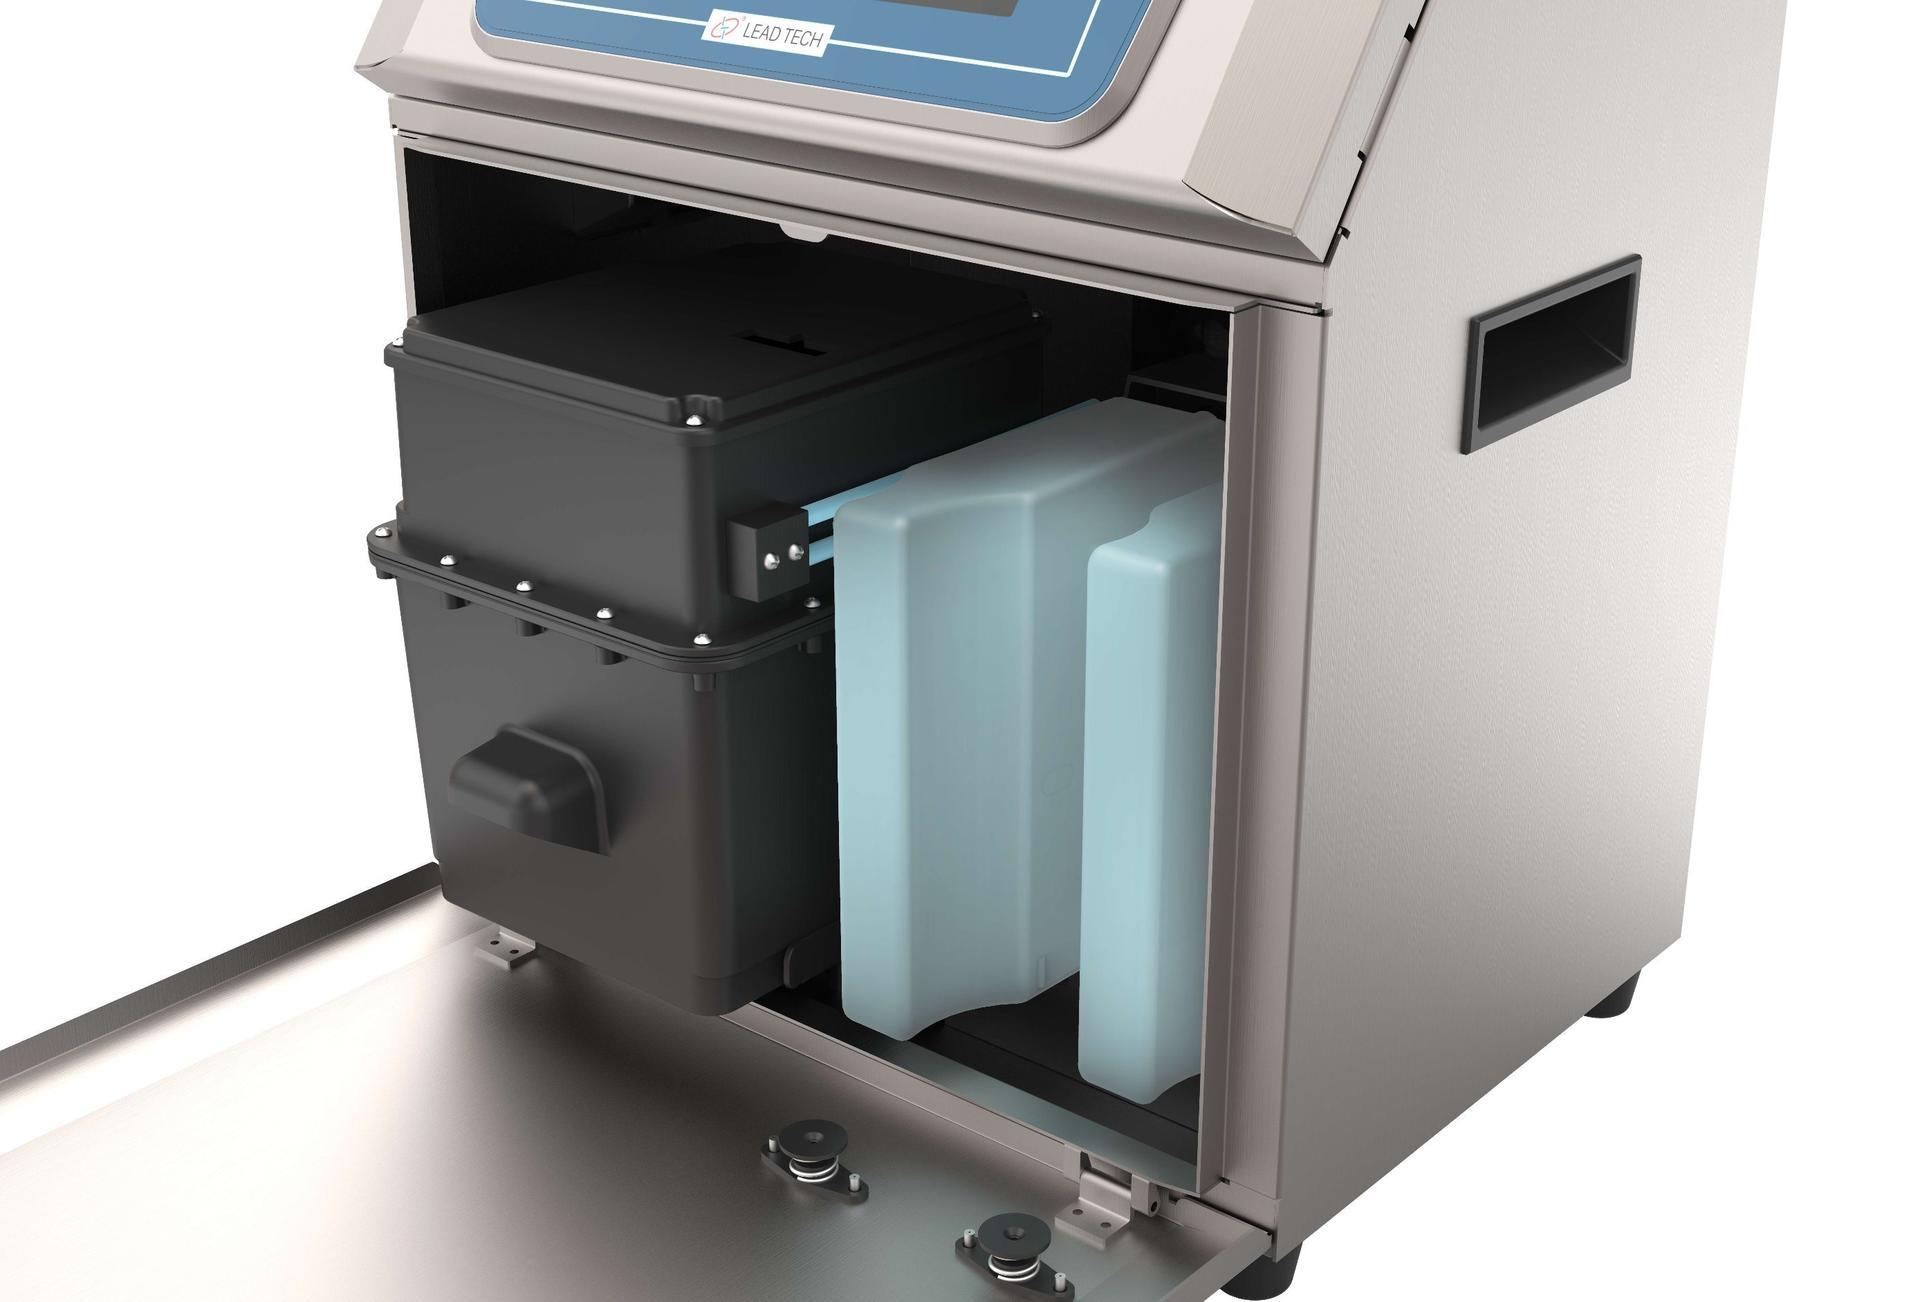 Lead Tech Lt800 HDPE Coding Cij Inkjet Printer